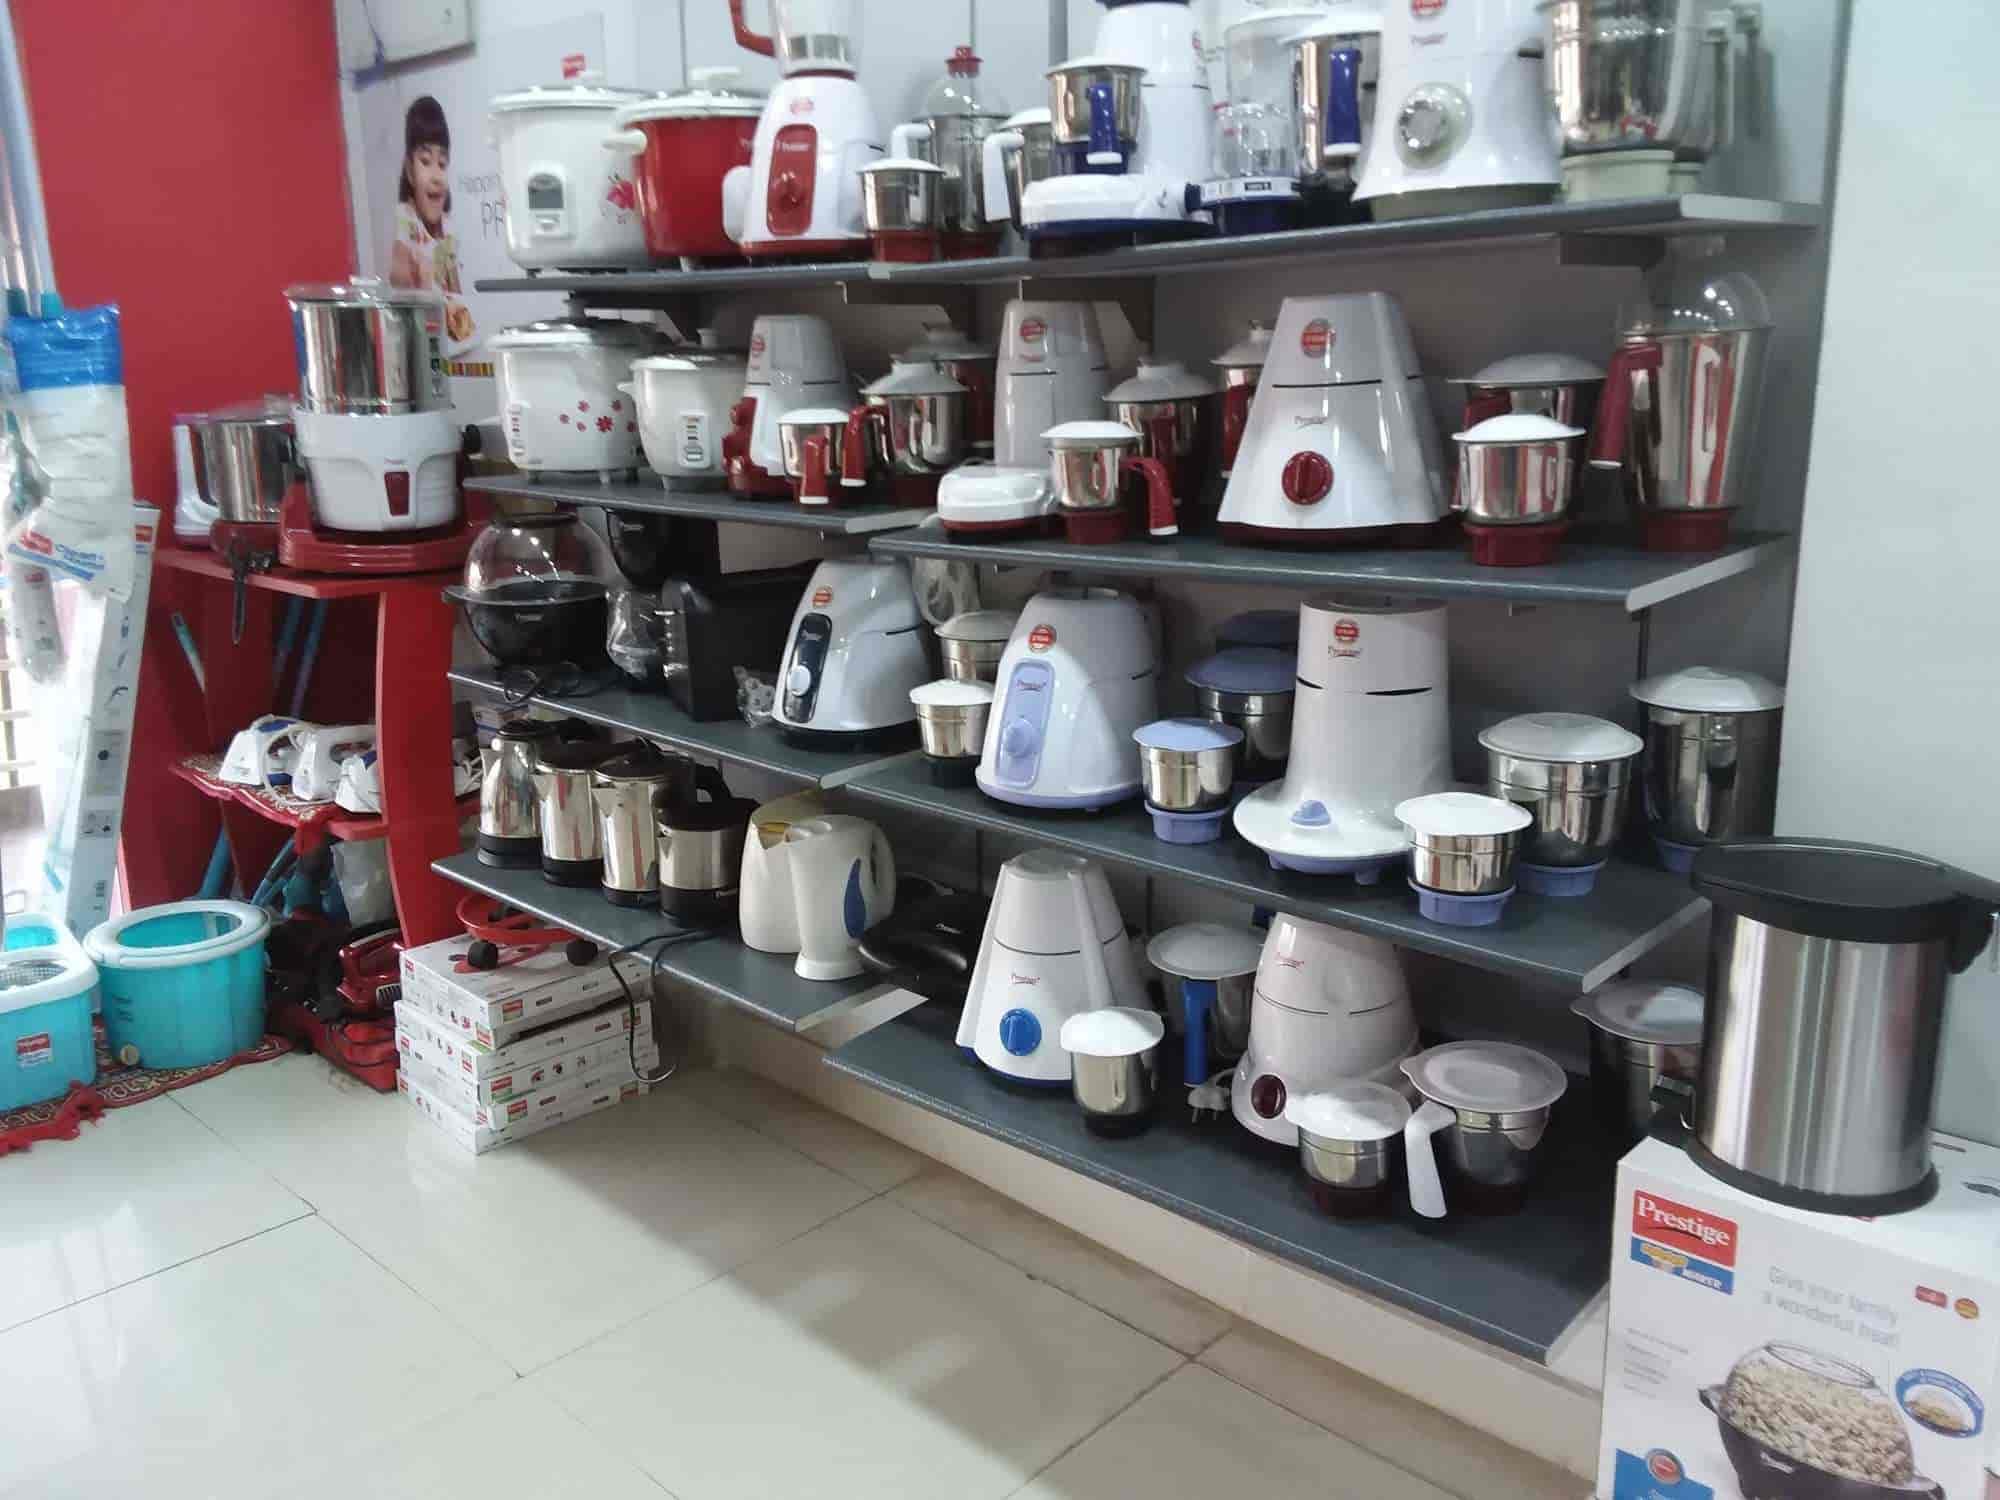 Prestige Smart Kitchen Photos, Nagamallithota Junction, Kakinada ...